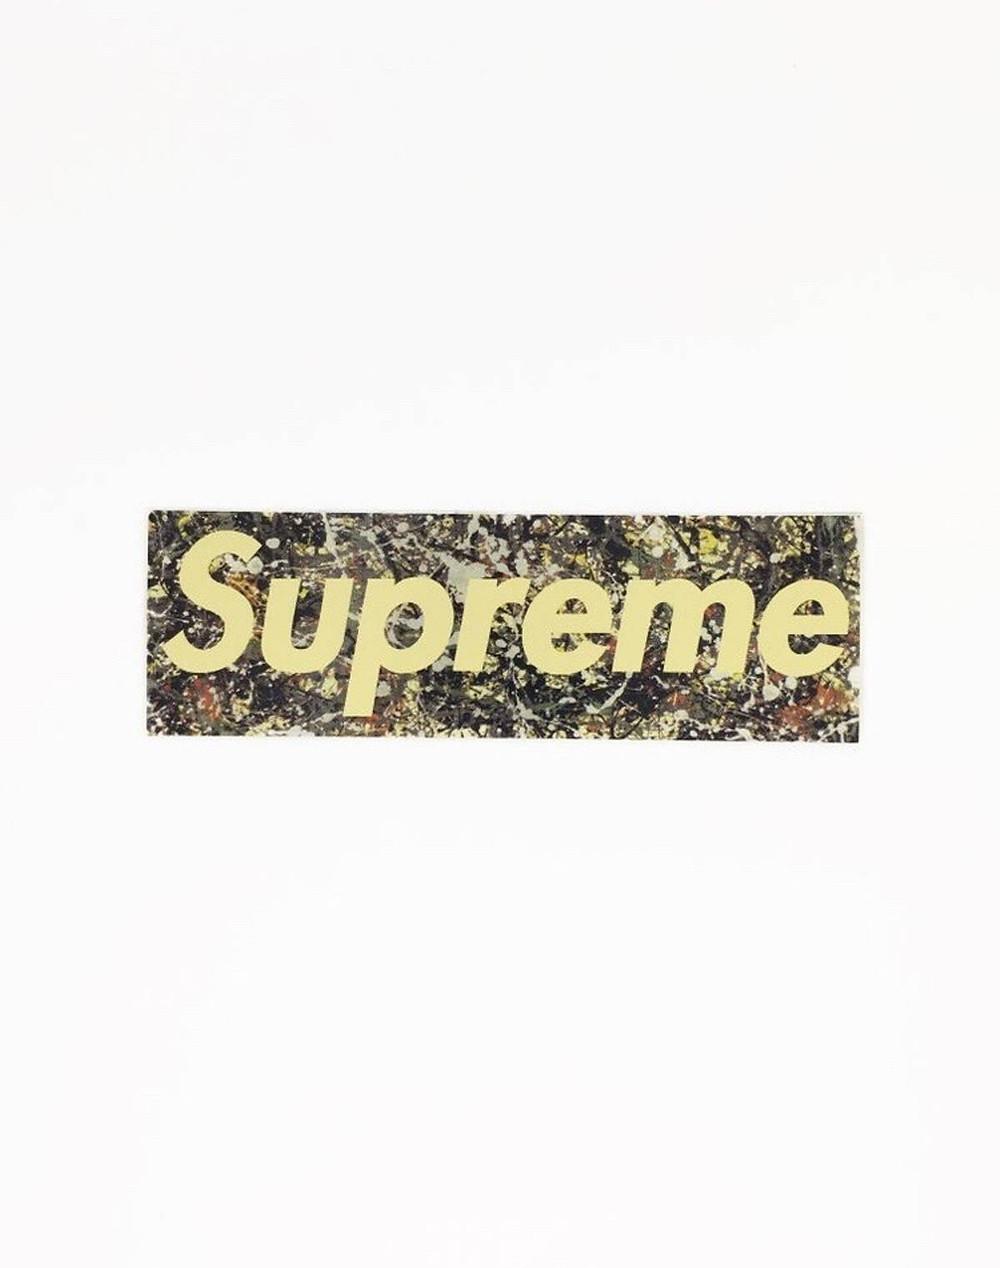 Supreme Box Logo feeat. Jackson Pollock Painting